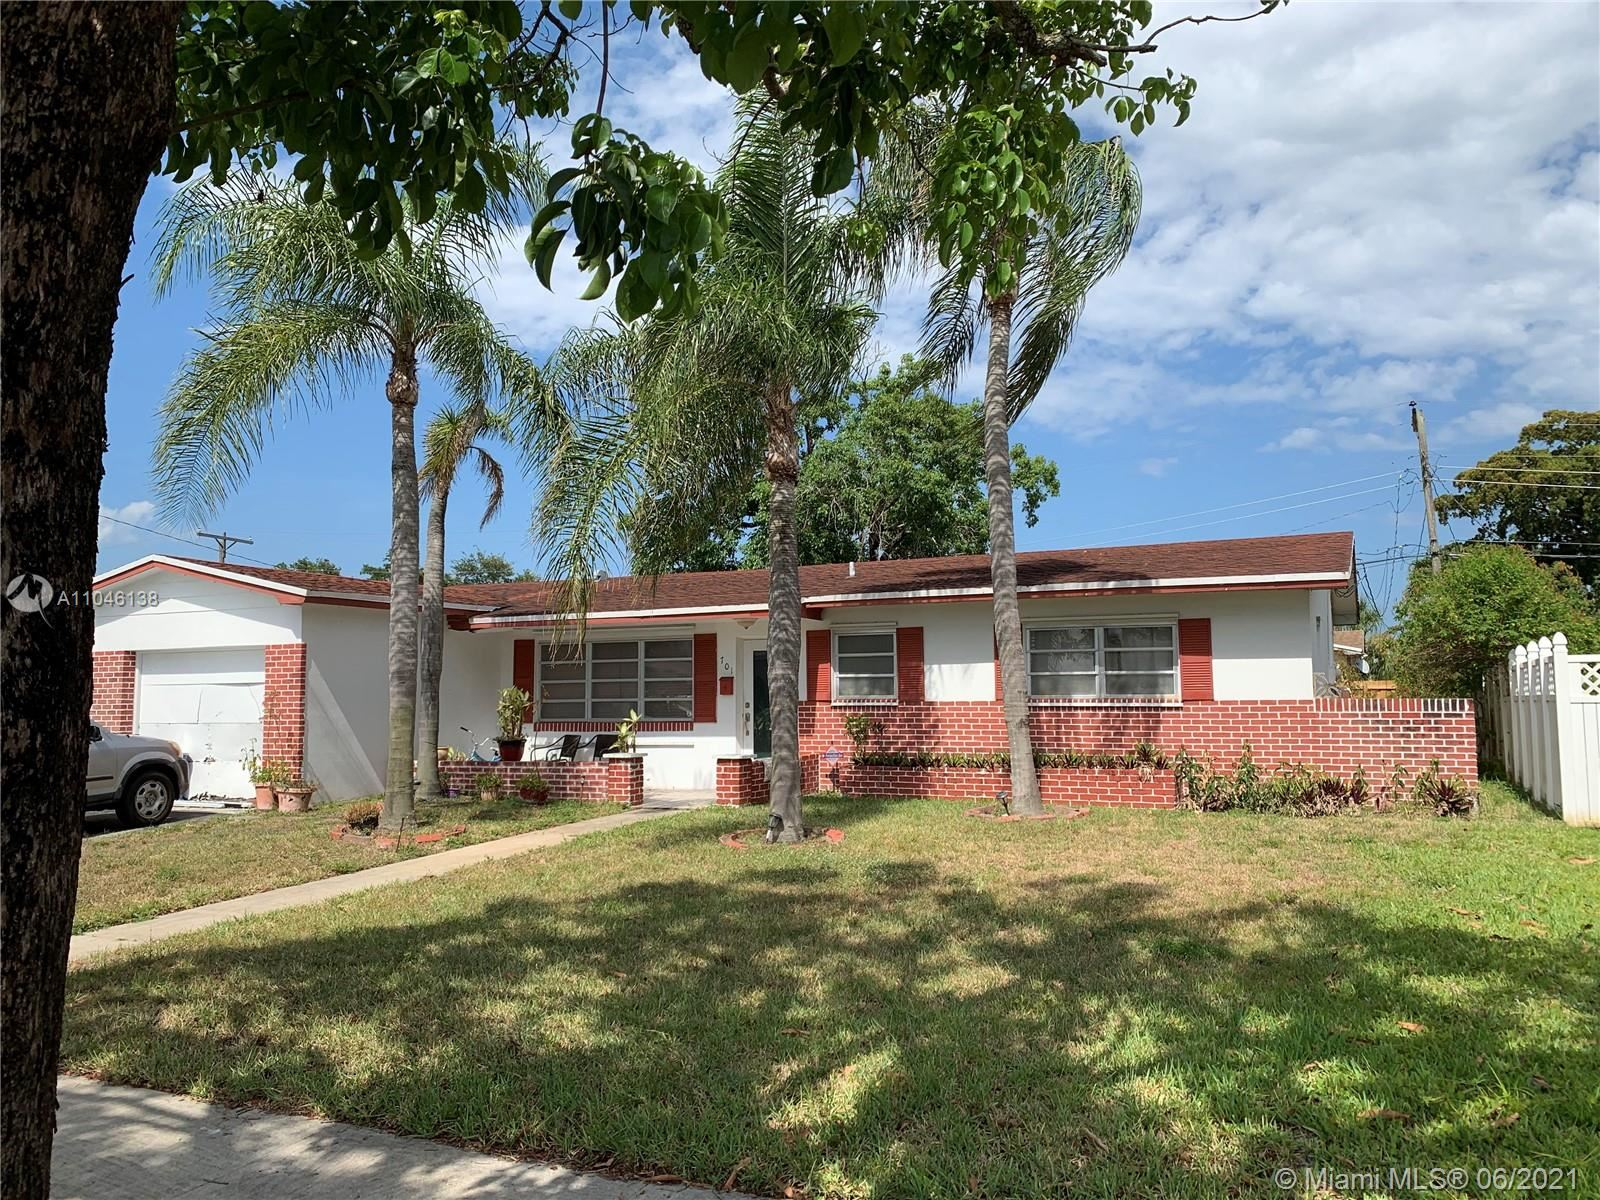 701 NW 78th Ave, Pembroke Pines, FL 33024 - #: A11046138